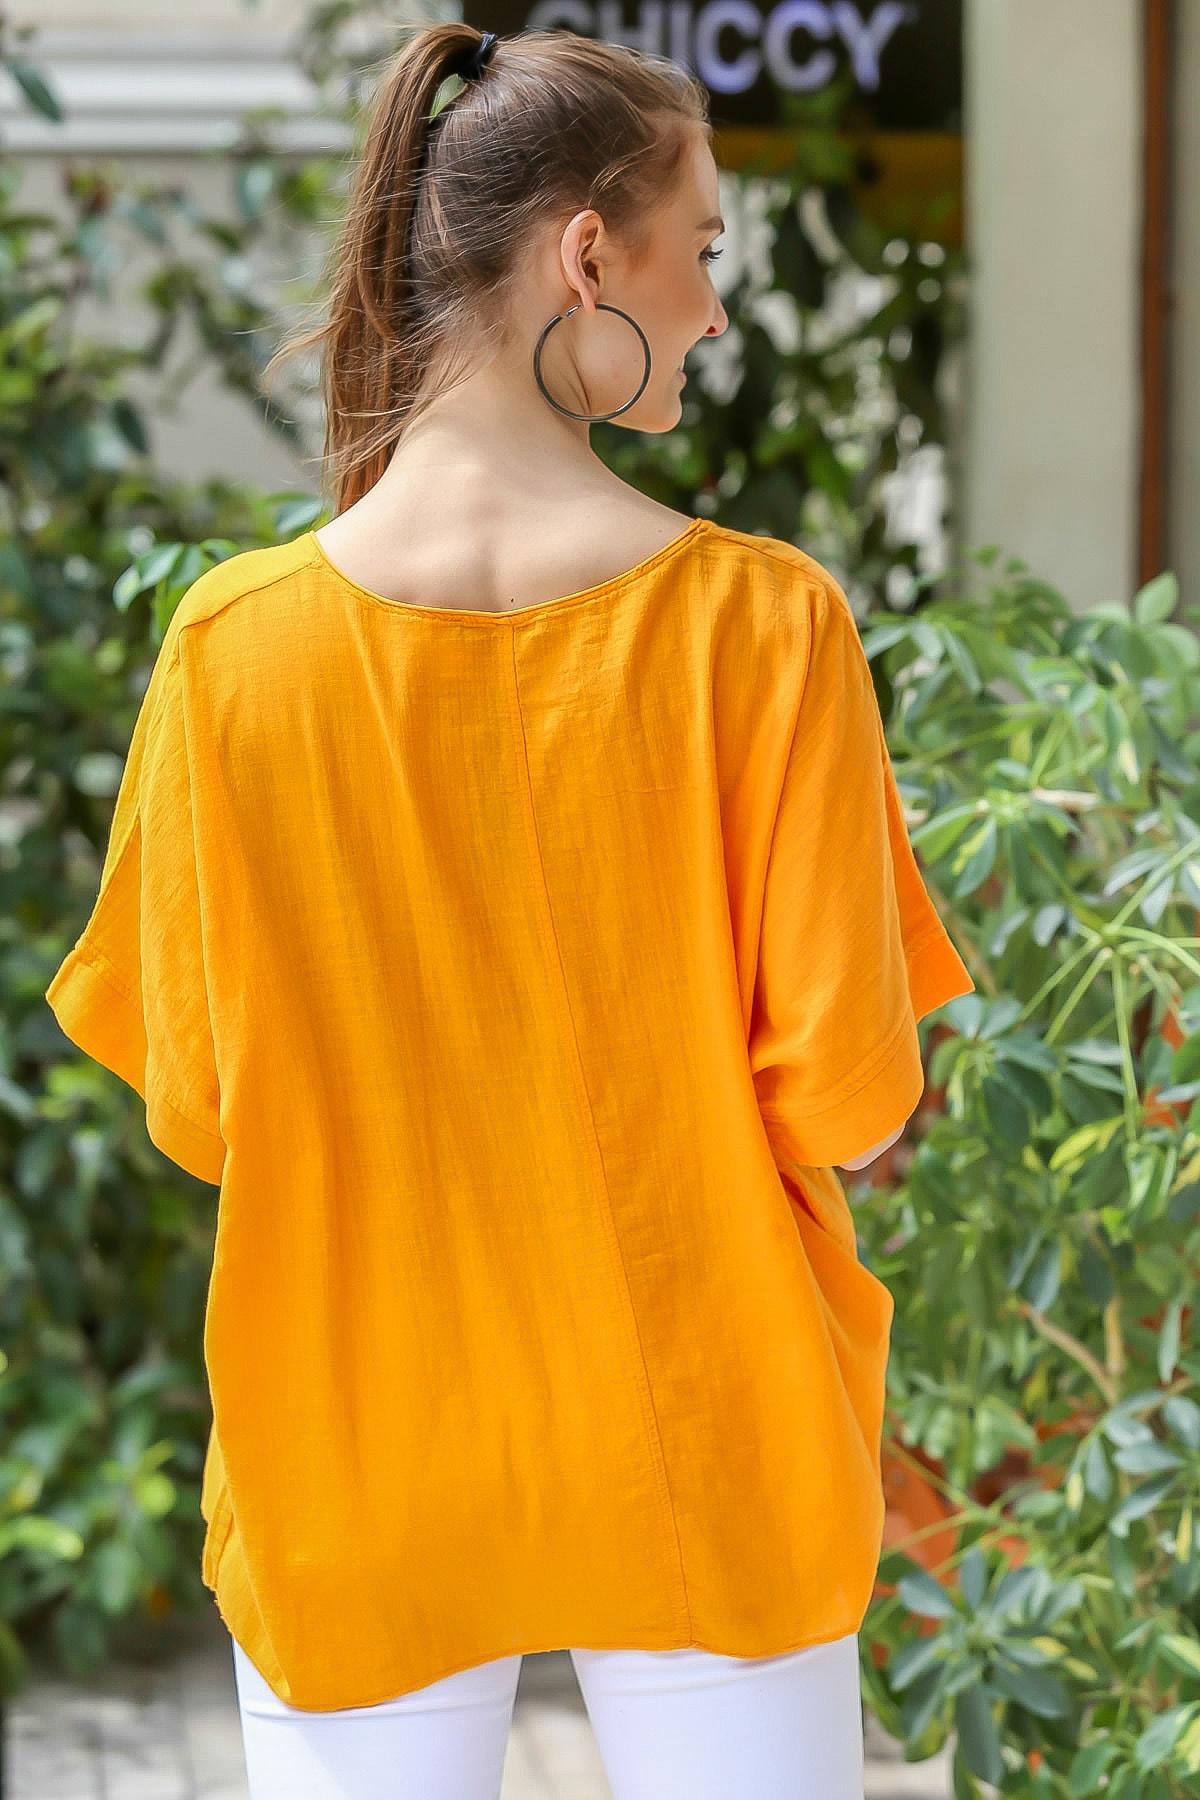 Chiccy Kadın Turuncu  Sıfır Yaka Yalı Çapkını Kuş Desenli Salaş Dokuma Bluz M10010200BL95418 4